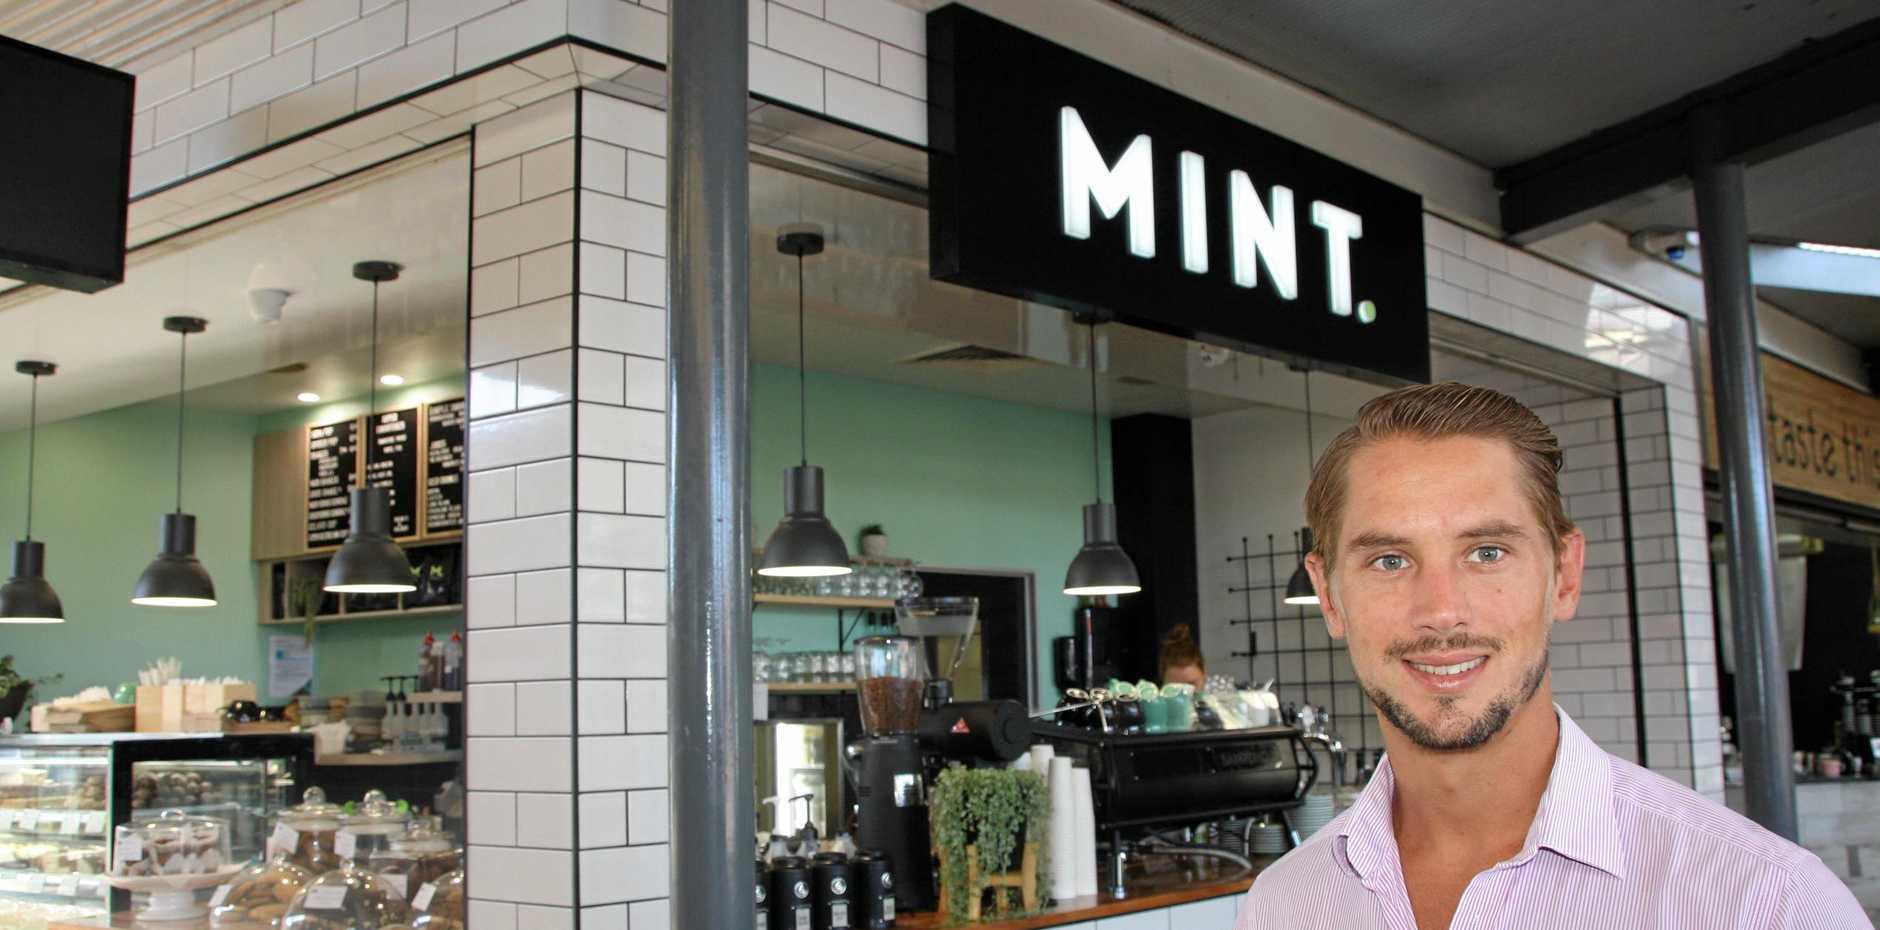 RIGHT MIX: Peter Capps of Savills at Mint, Shop 8 Buderim Marketplace.